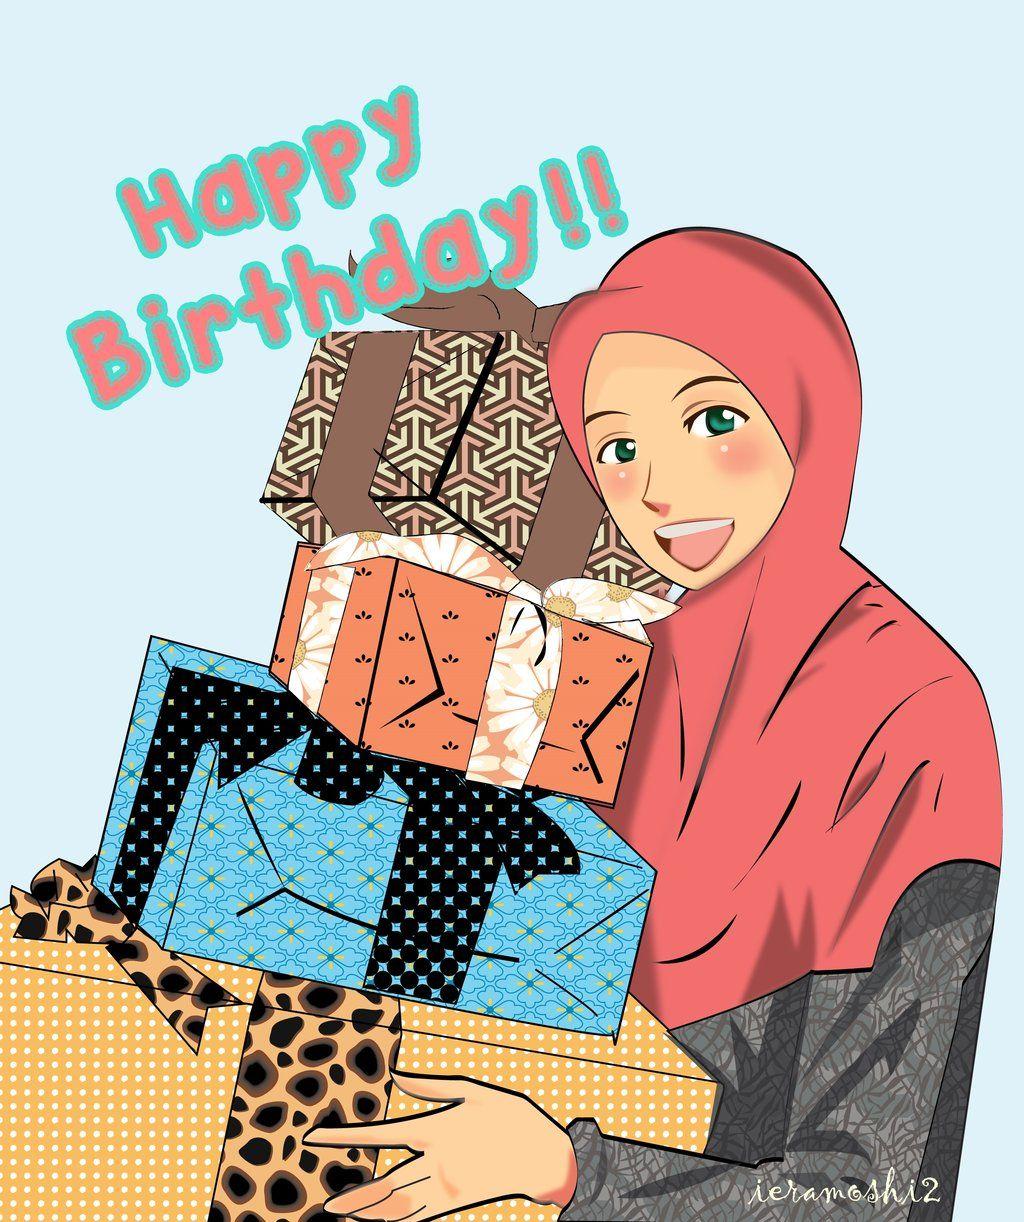 Happy Birthday By Ieramoshi2 On Deviantart Funny Birthday Cartoons Muslim Birthday Wishes Islamic Birthday Wishes